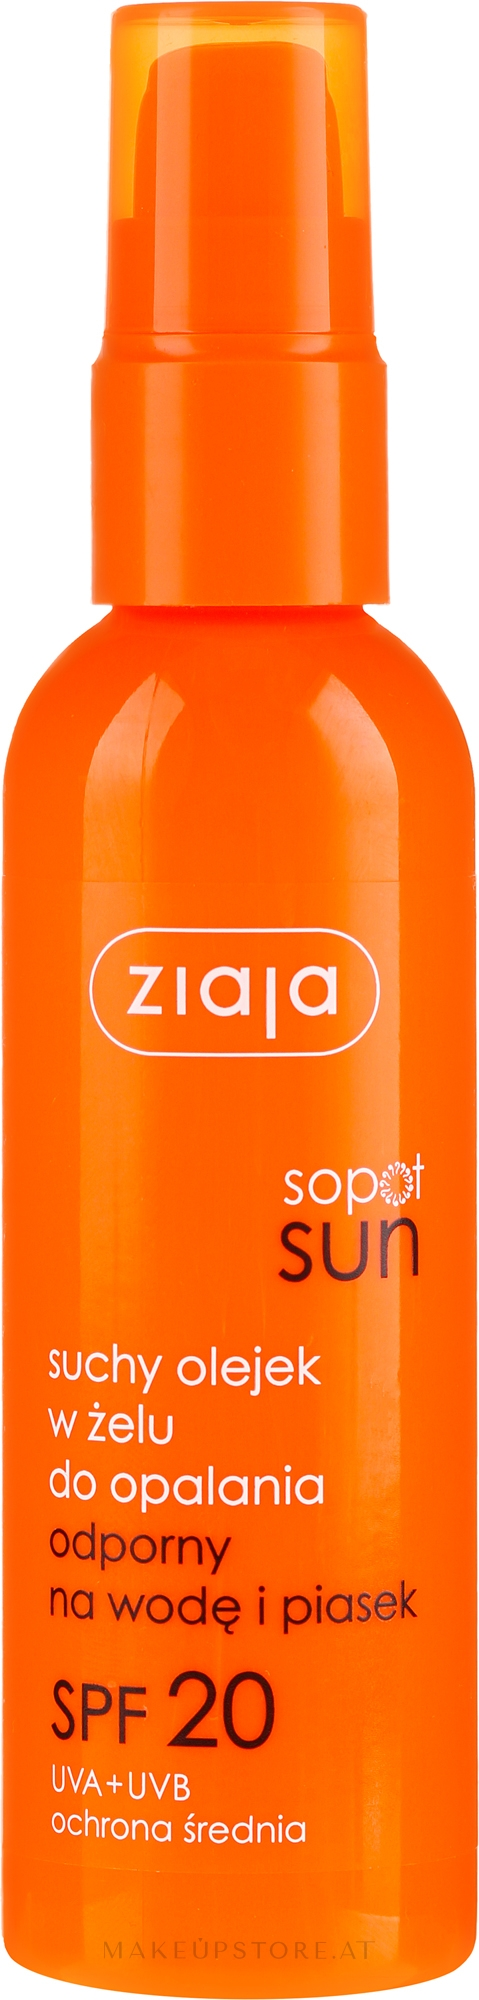 Trockenes Sonnenschutzöl-Gel für den Körper SPF 20 - Ziaja Sopot Sun SPF 20 — Bild 90 ml